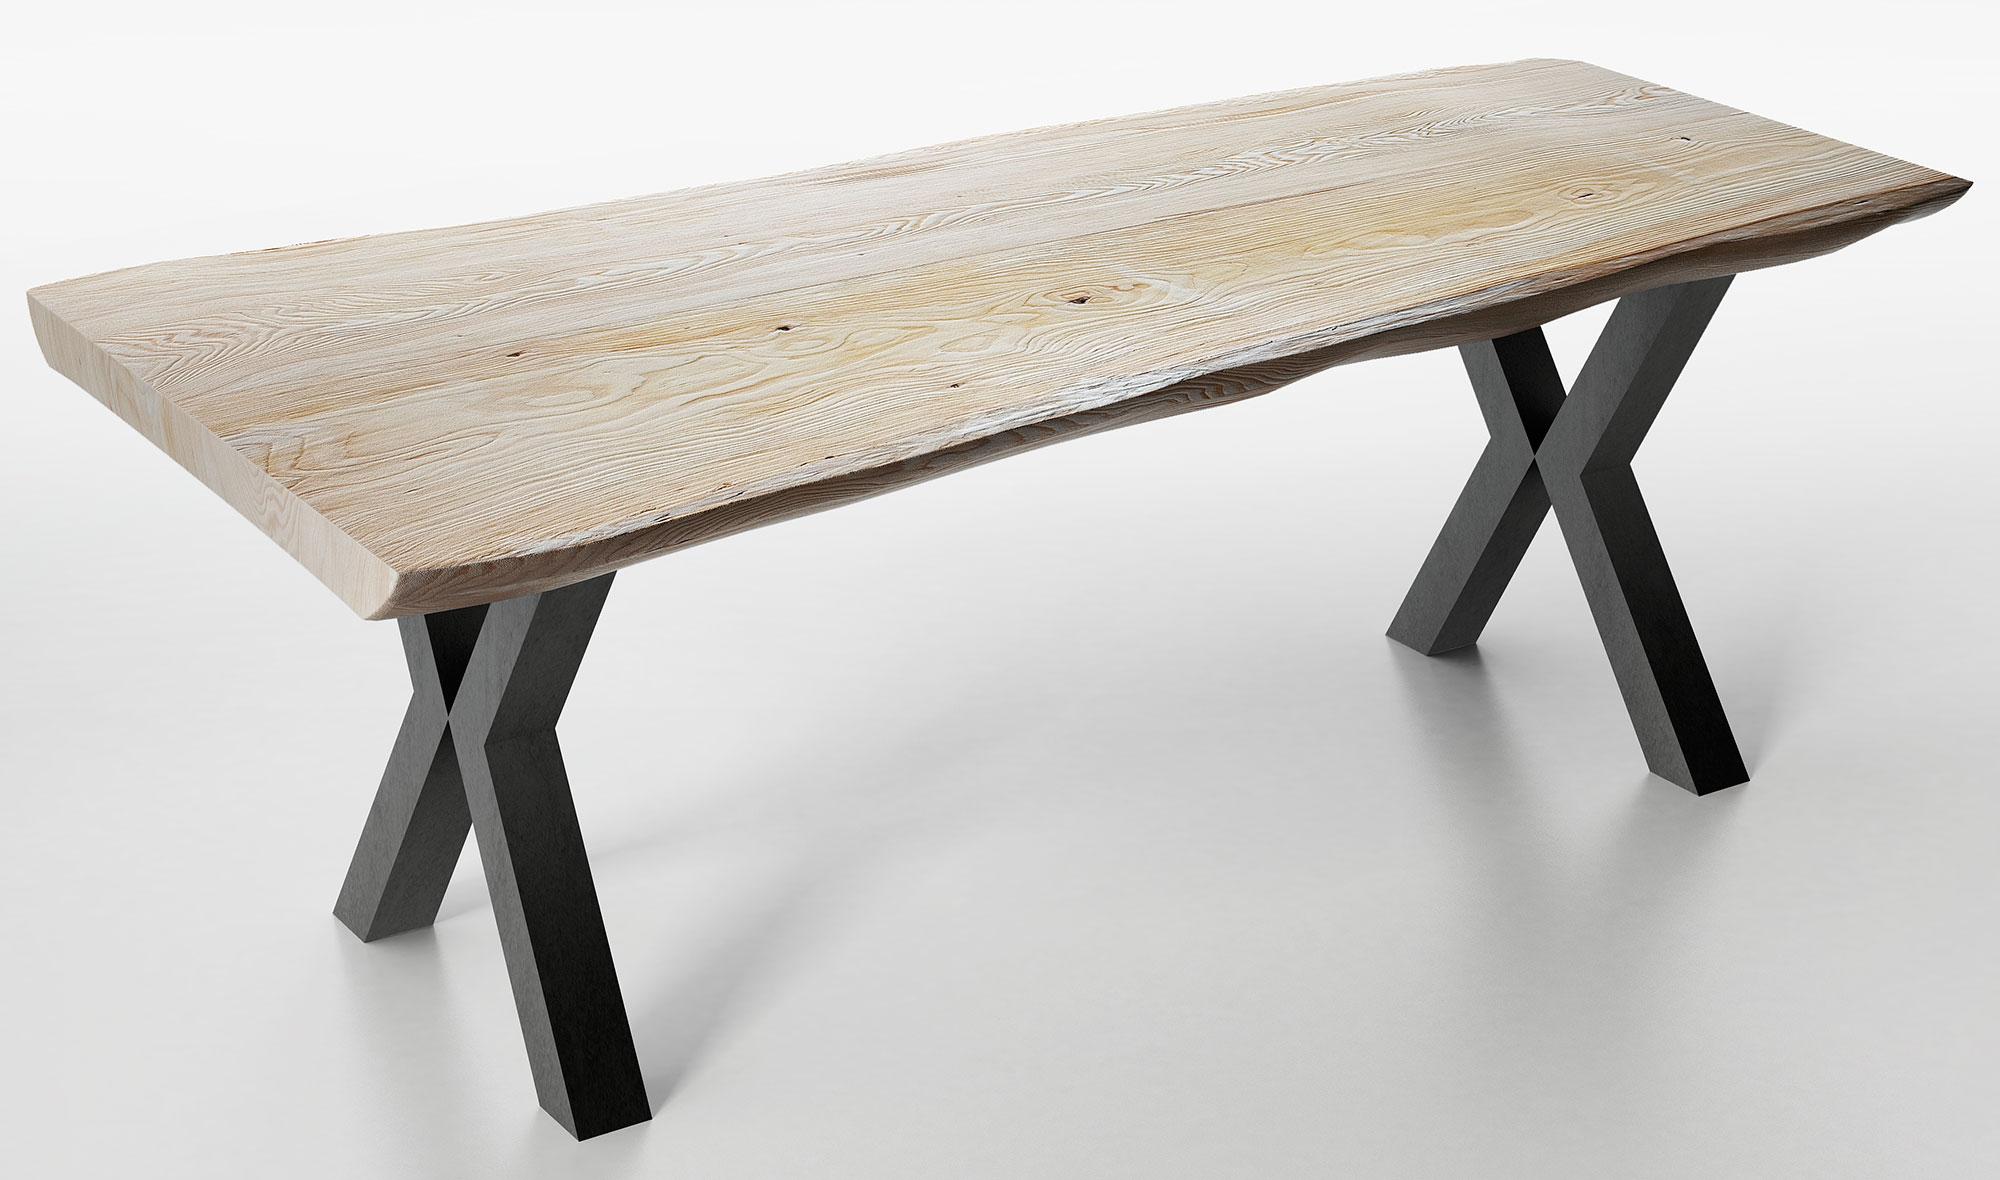 Mesa de comedor madera maciza roble Juli de lujo en